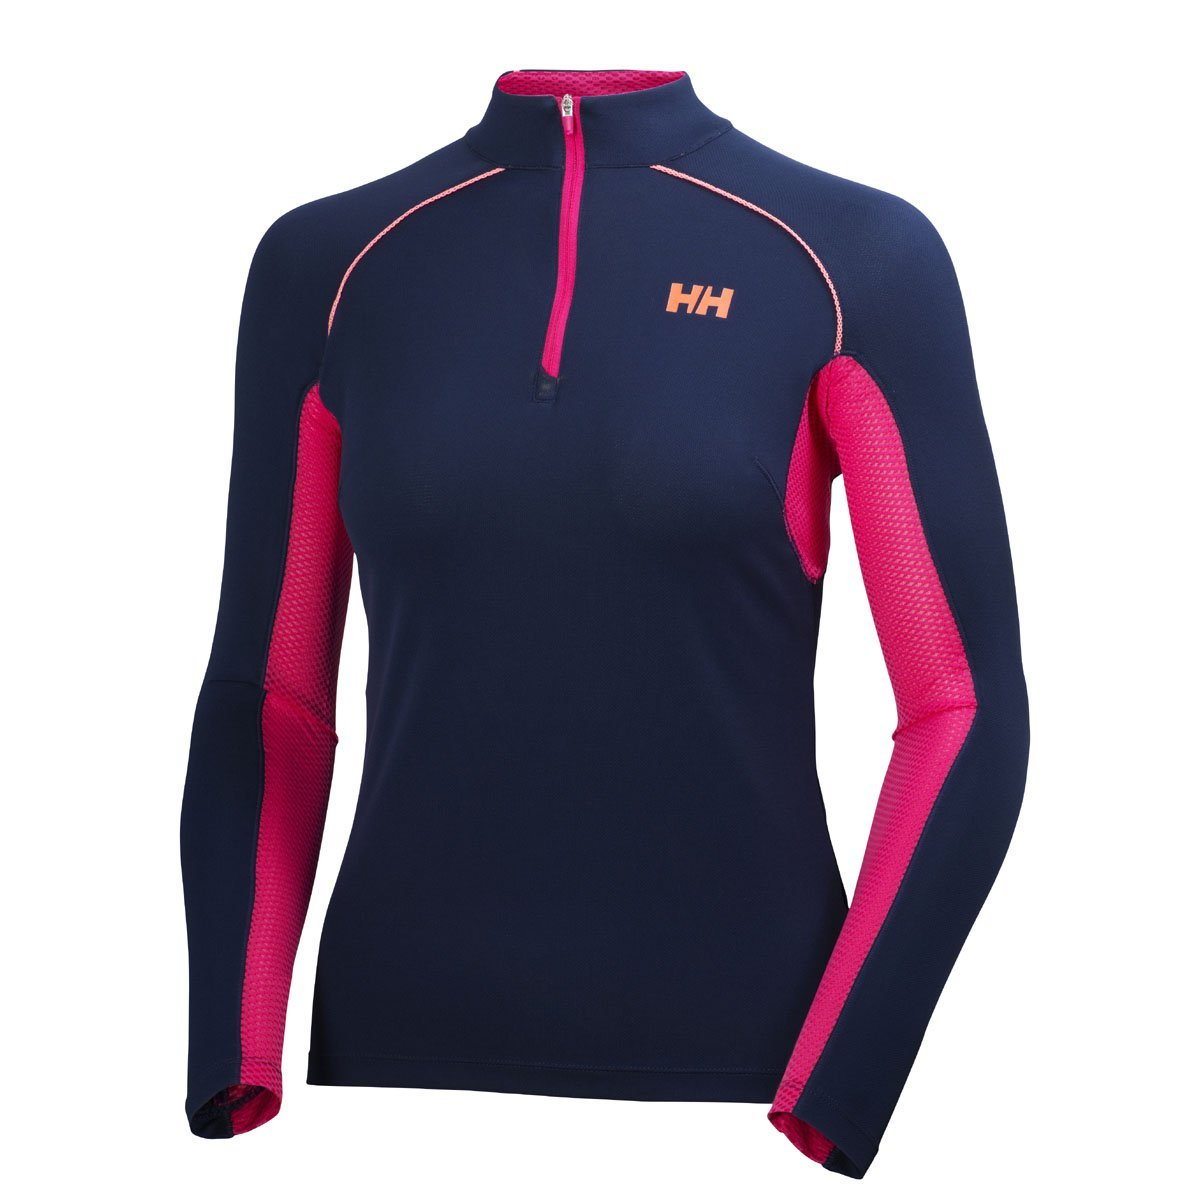 Helly Hansen 2015/16 Women's Enroute 1/2 Zip LIFA Flow Long Sleeve Top